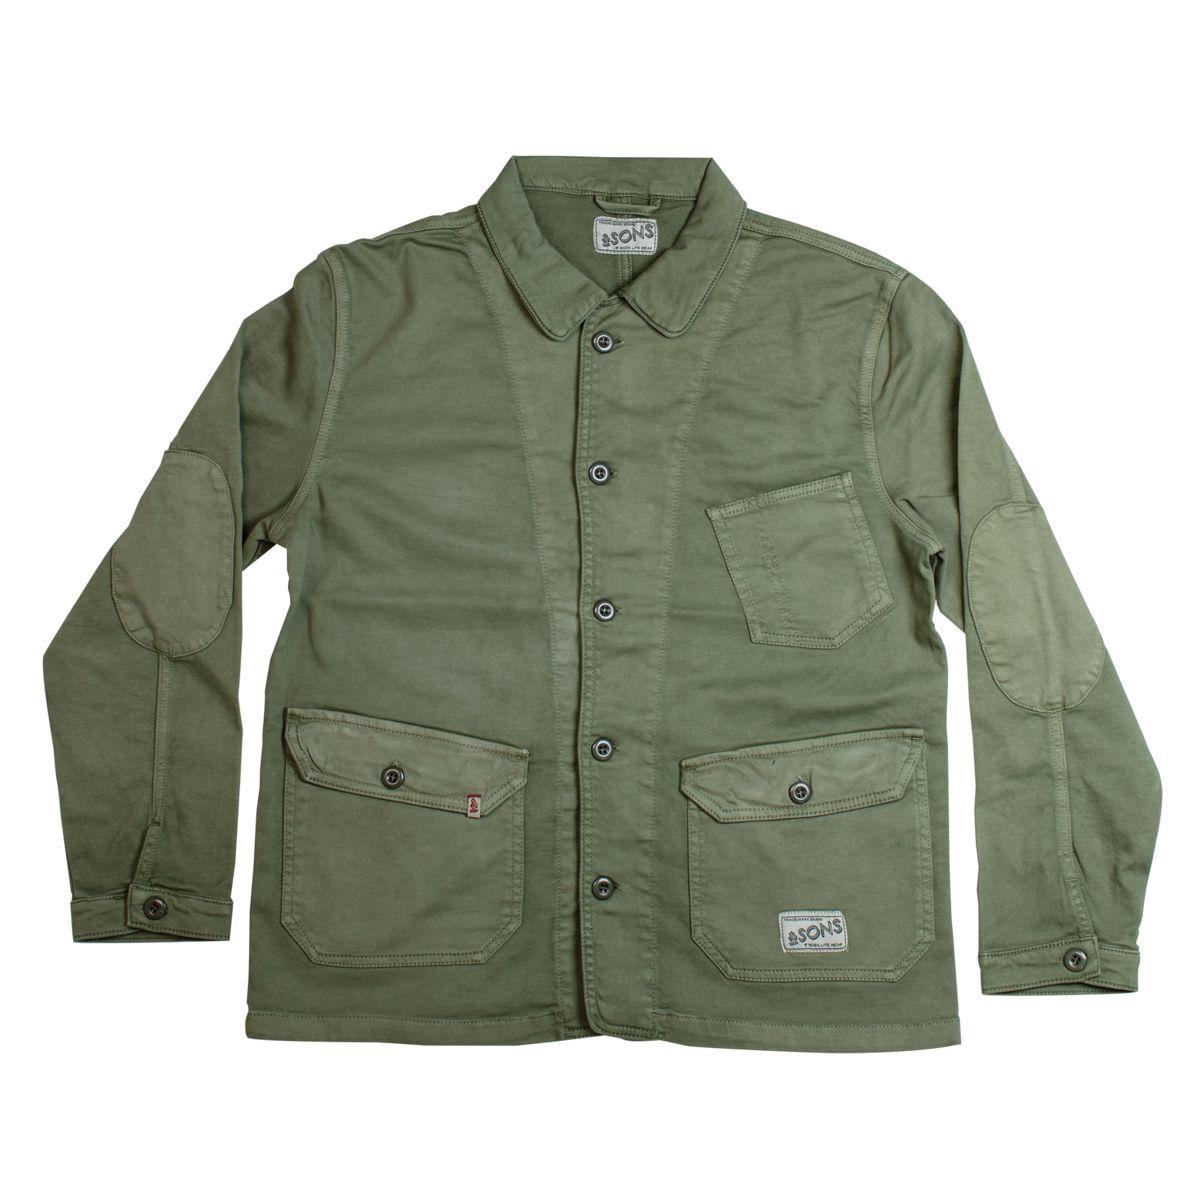 &SONS Carver Jacket   Versatile Heavy Cotton Army Green Jacket